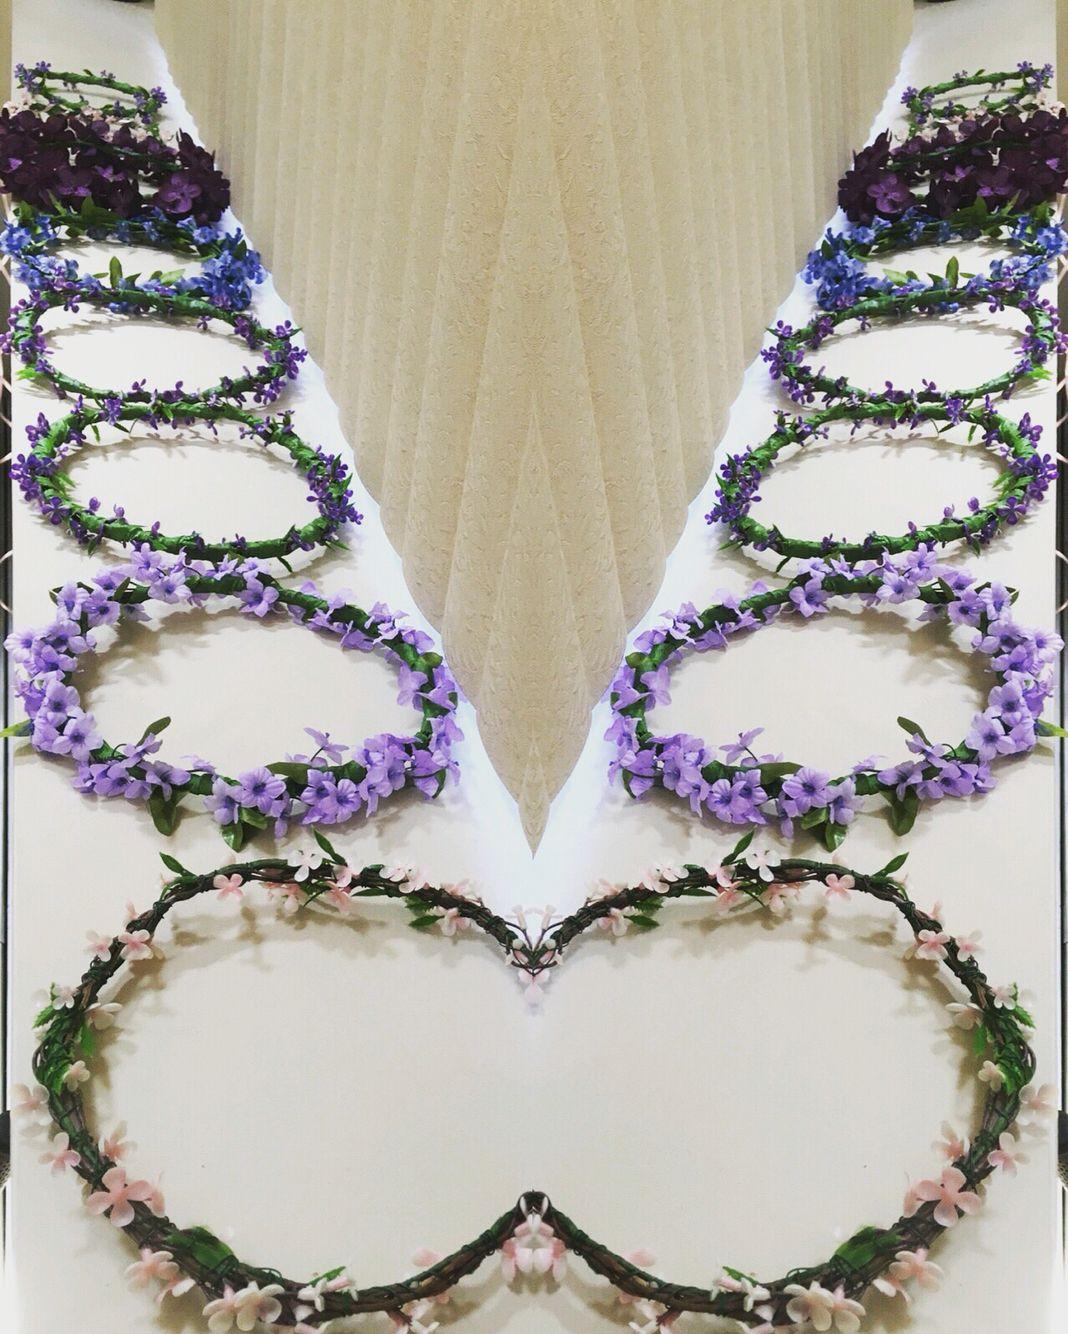 Diy flower crowns diy flower crowns pinterest diy flower diy flower crowns izmirmasajfo Images